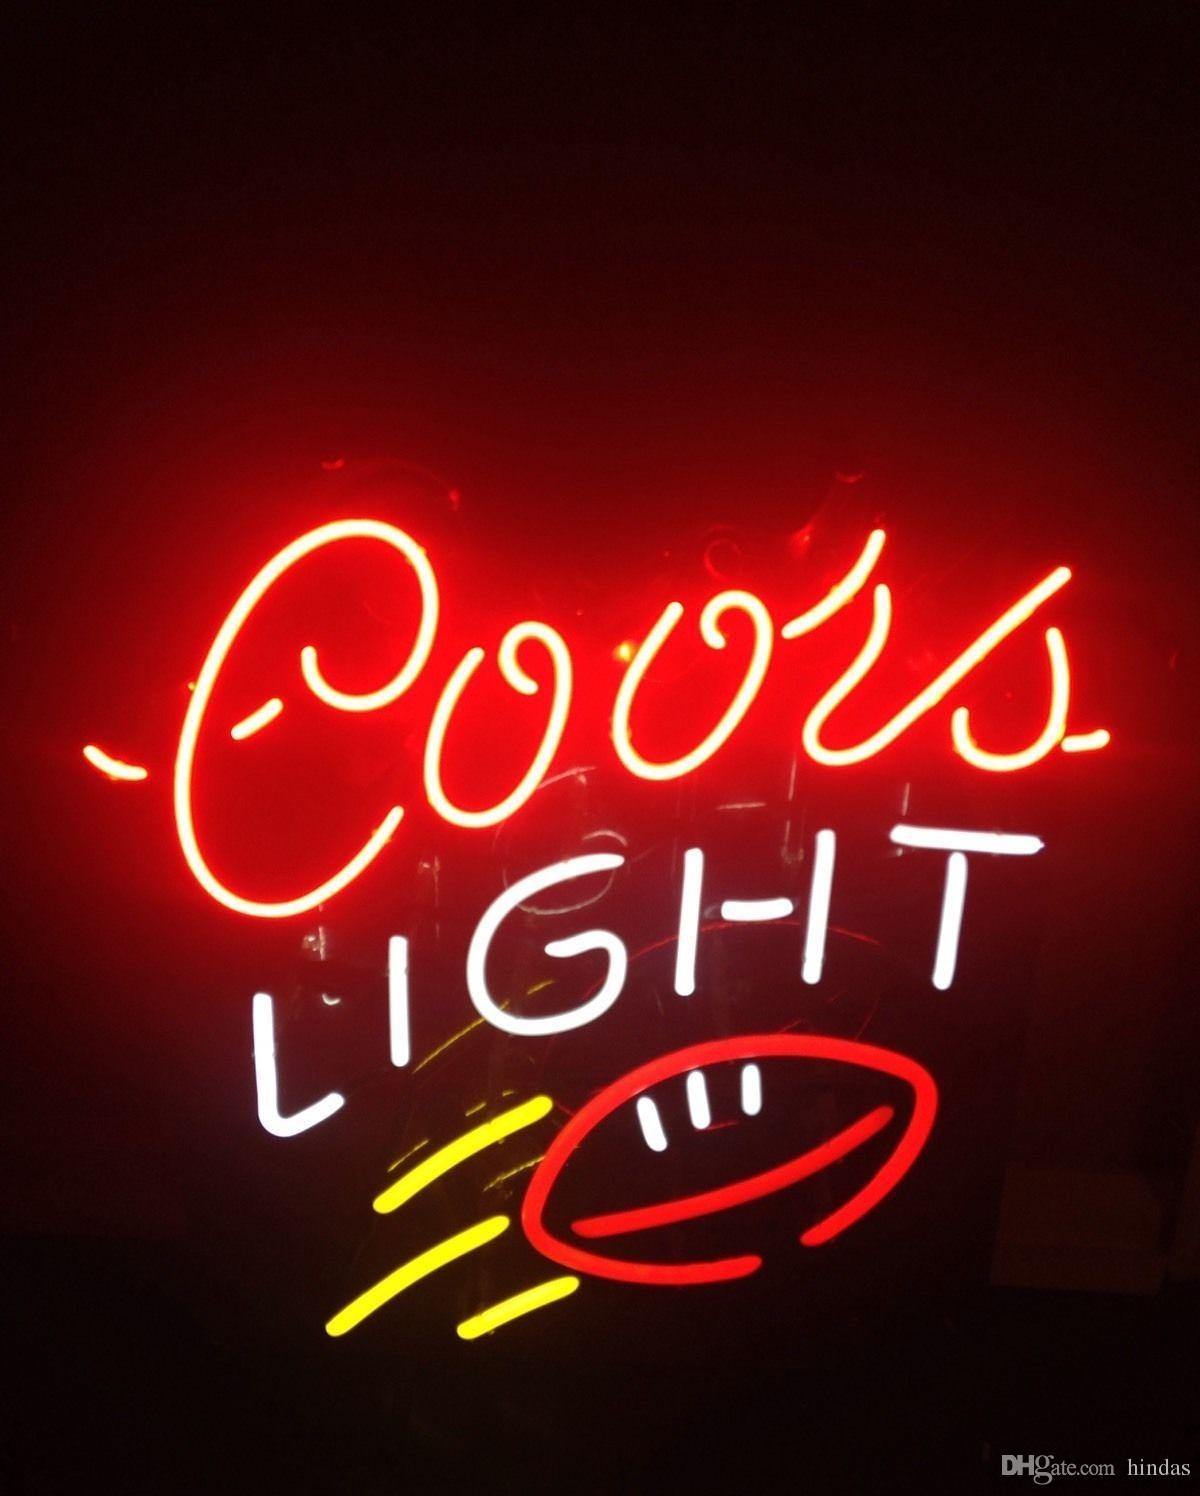 2018 new coors light football beer bar neon light sign 24x20 001 2018 new coors light football beer bar neon light sign 24x20 001 from hindas 17588 dhgate aloadofball Gallery